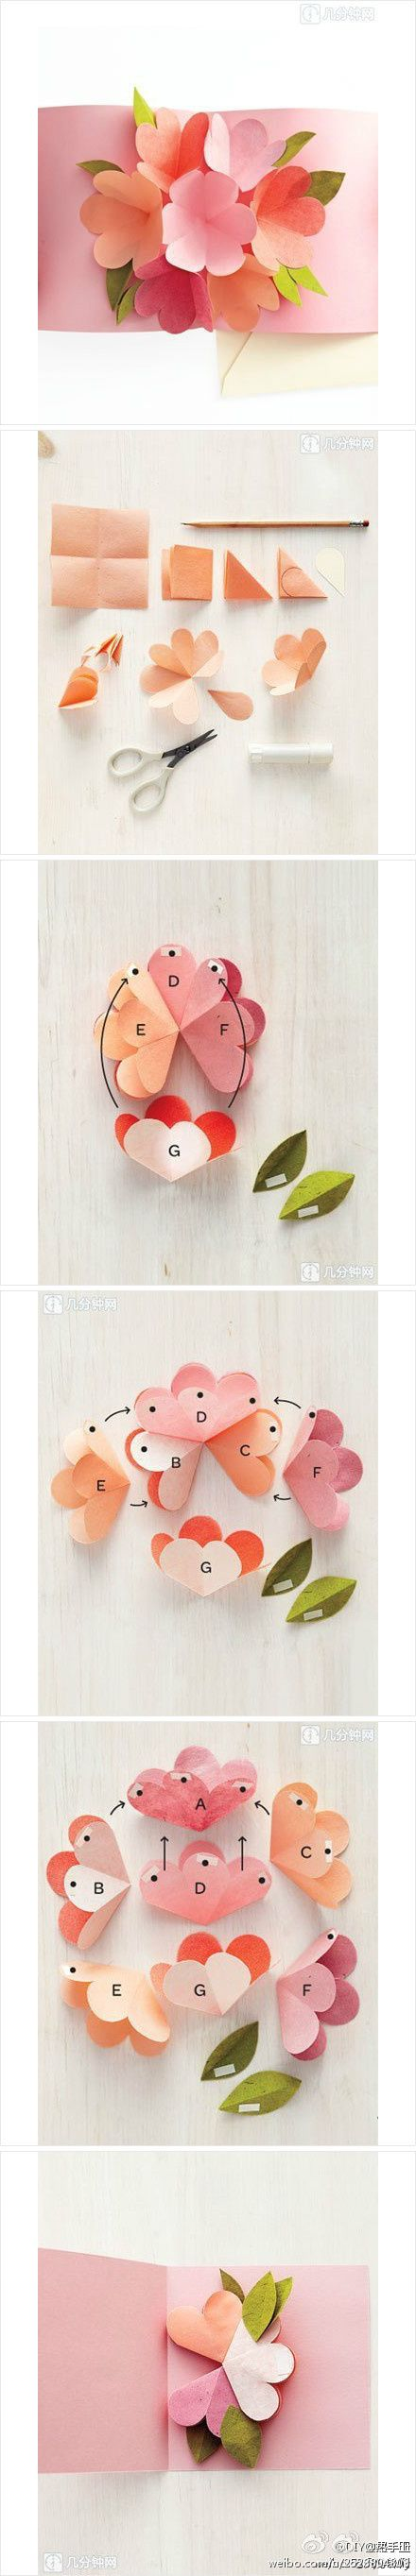 DIY Flower Pop Up Card DIY Projects | UsefulDIY.com